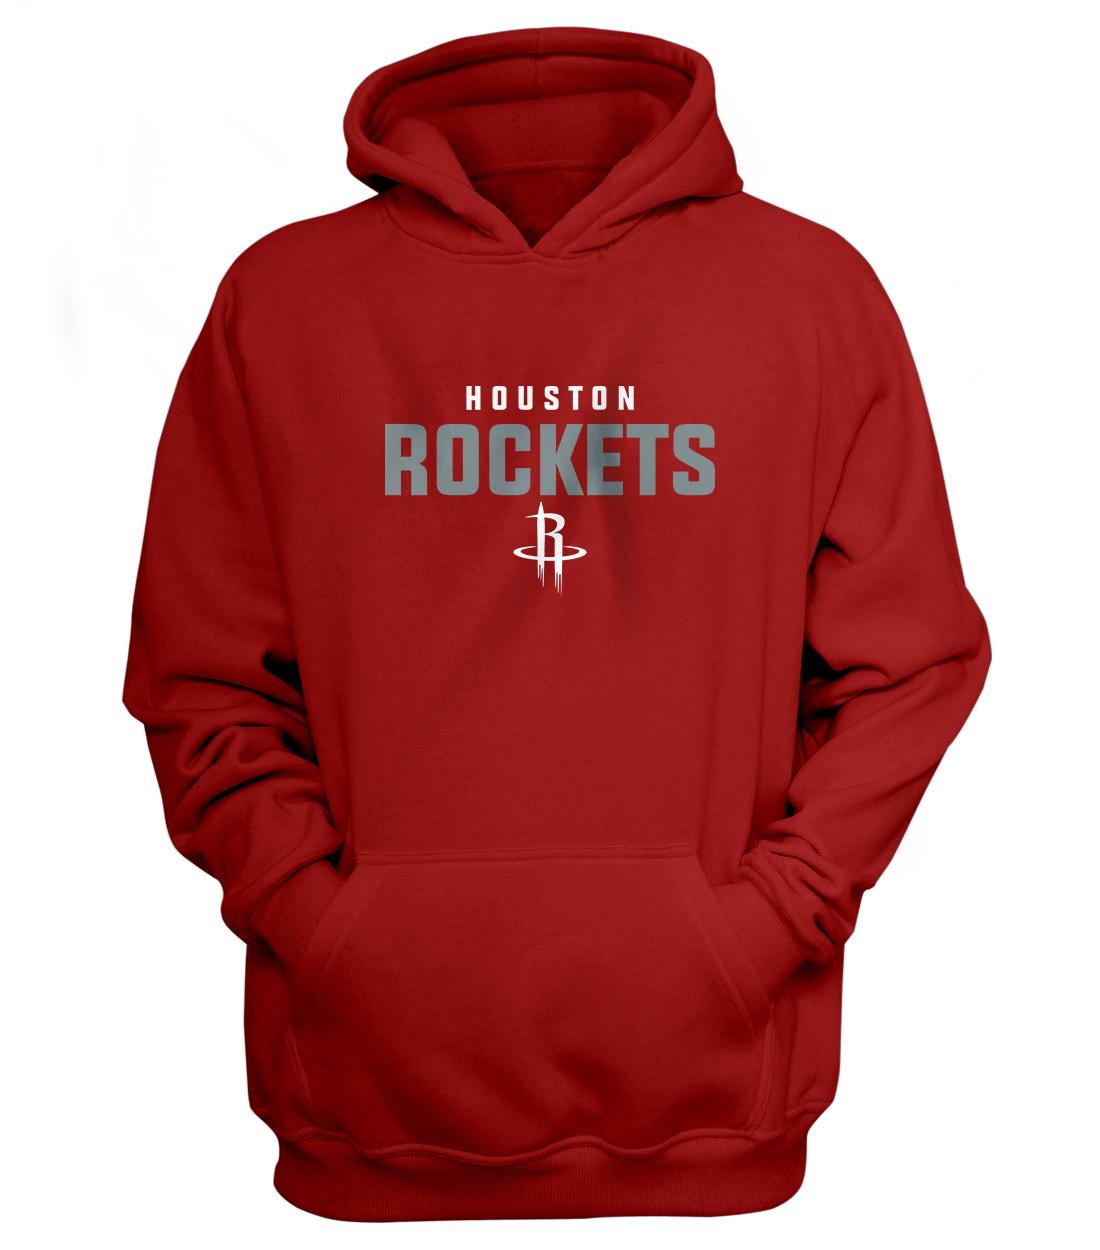 Houston Rockets Hoodie (HD-RED-NP-108-NBA-HOU-ROCKETS.FLAT)